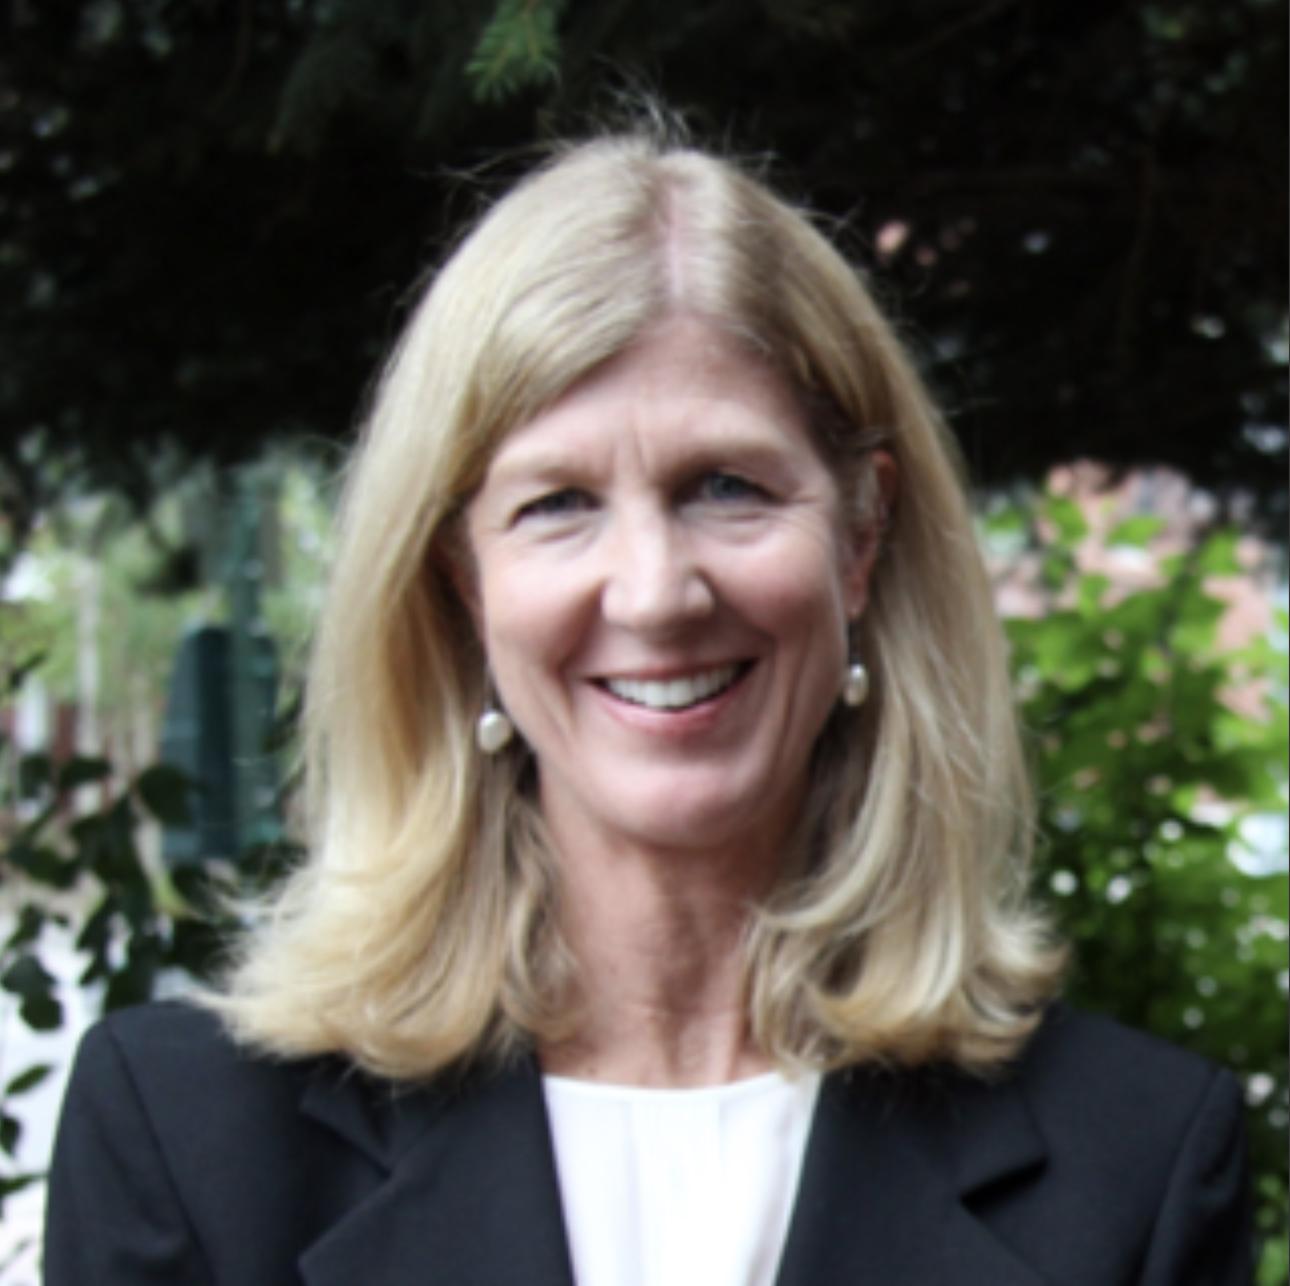 Dr. Rebecca Smith-Coggins, Professor of Emergency Medicine